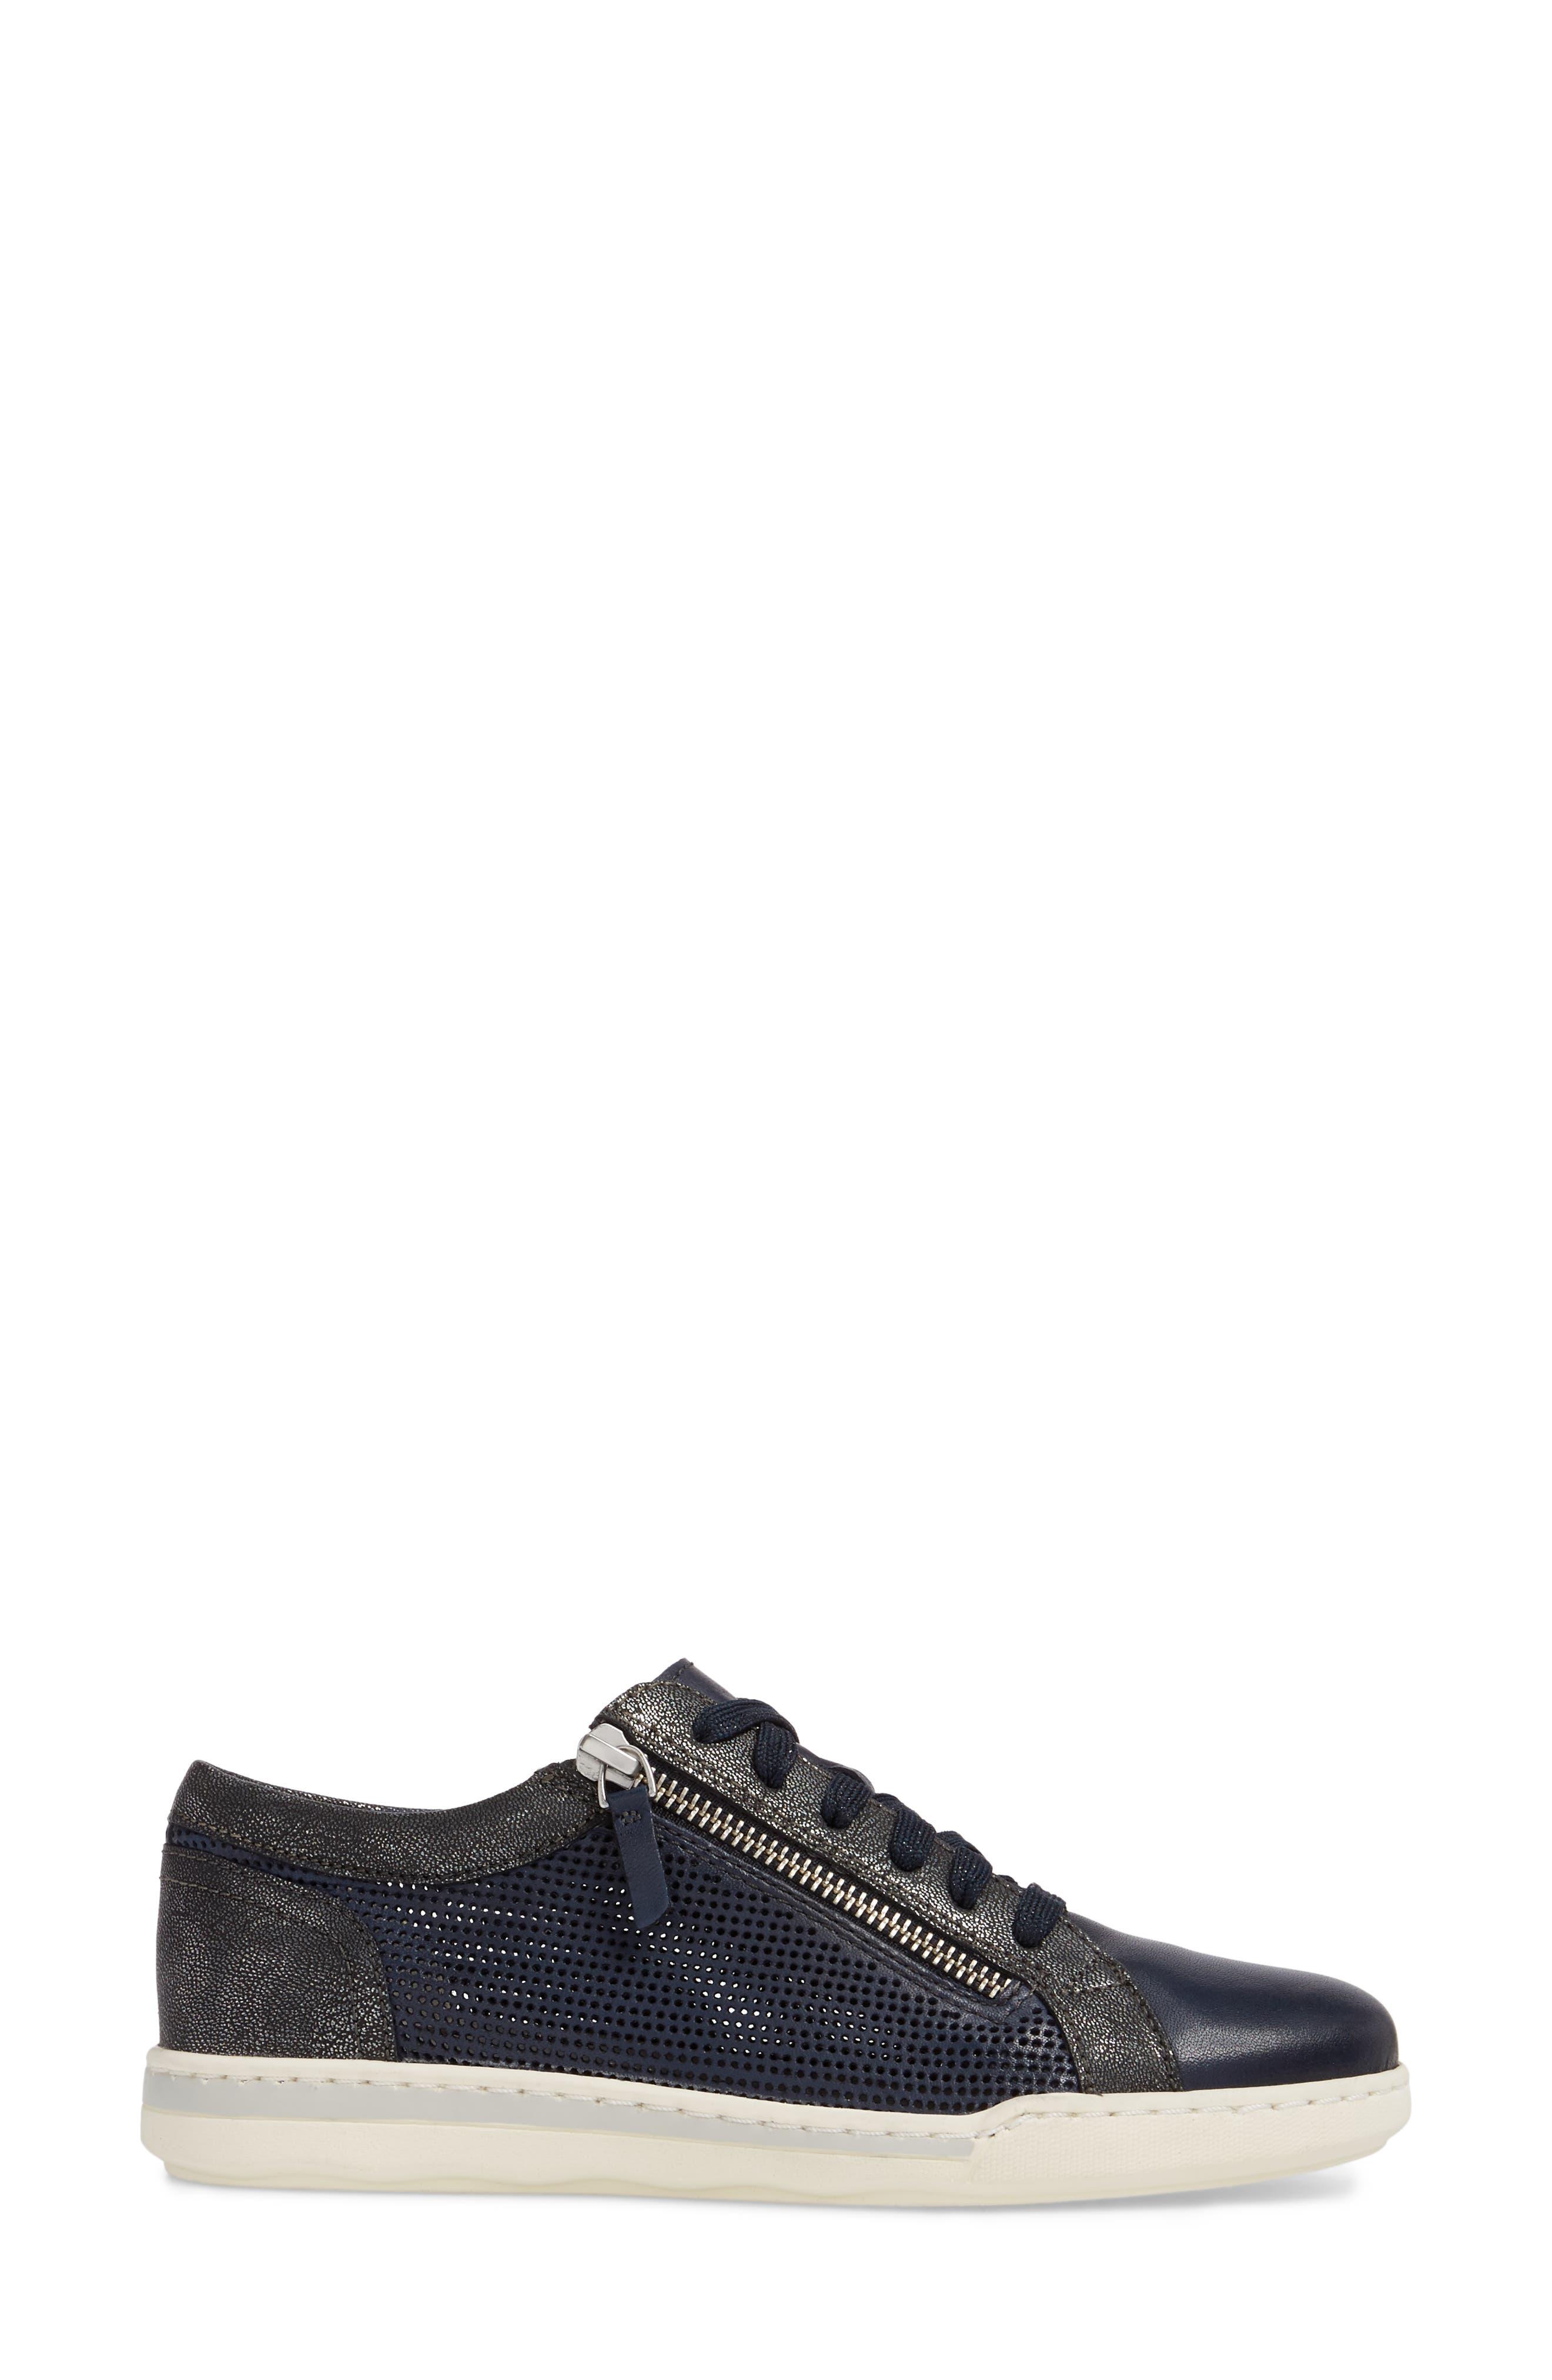 Freya Sneaker,                             Alternate thumbnail 3, color,                             Navy Leather